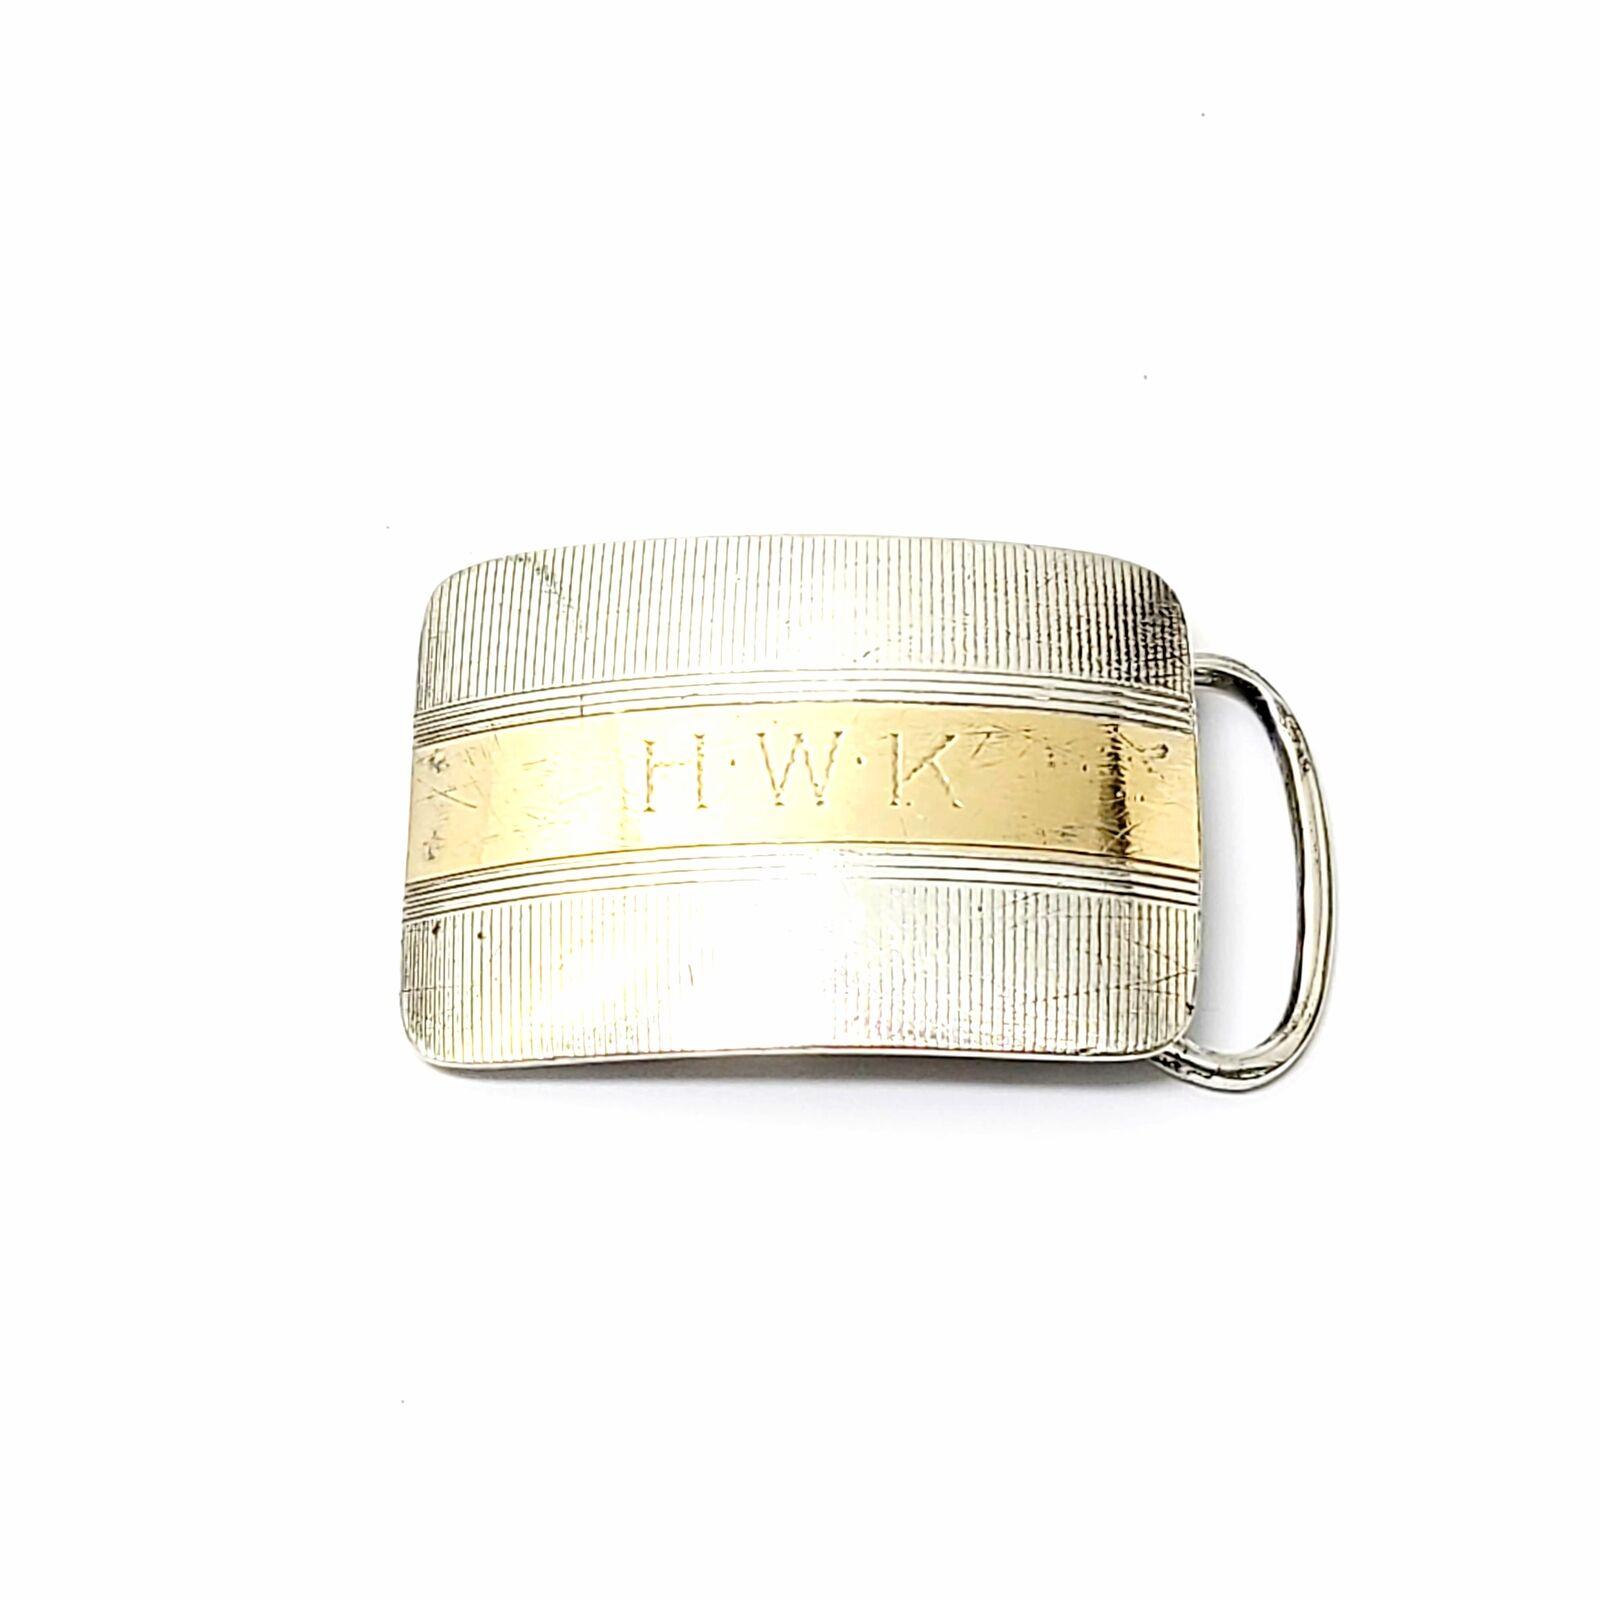 Antique Blackinton Sterling Silver 14K Yellow Gold Belt Buckle #8724